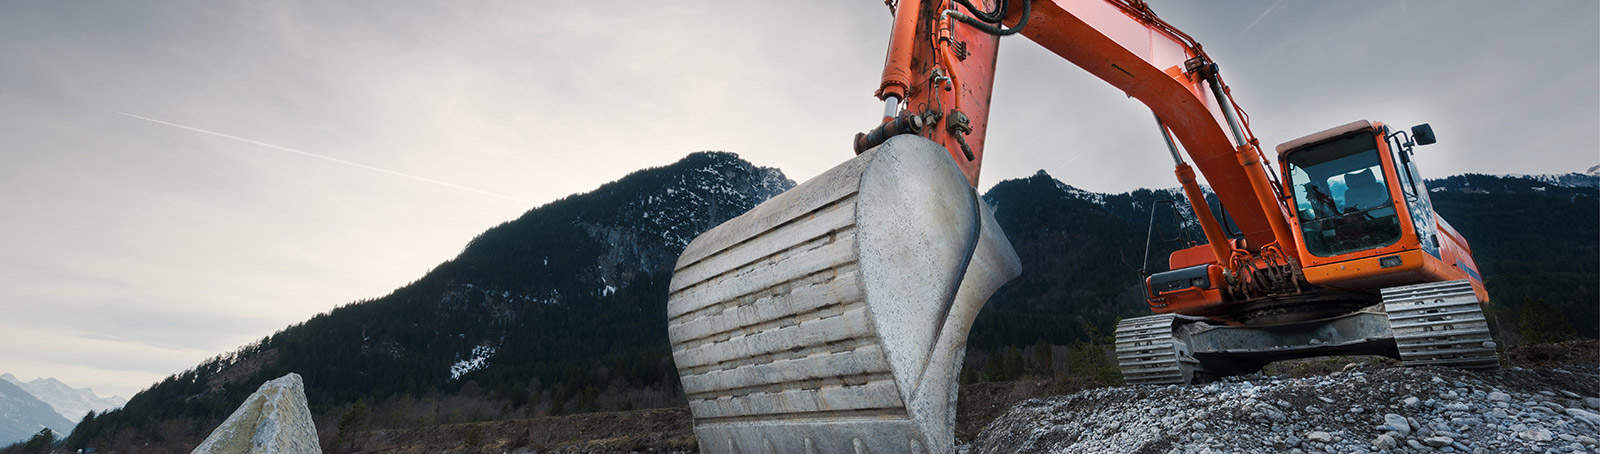 Construction, Machinery, Trucking & Big Rig Repair Financing